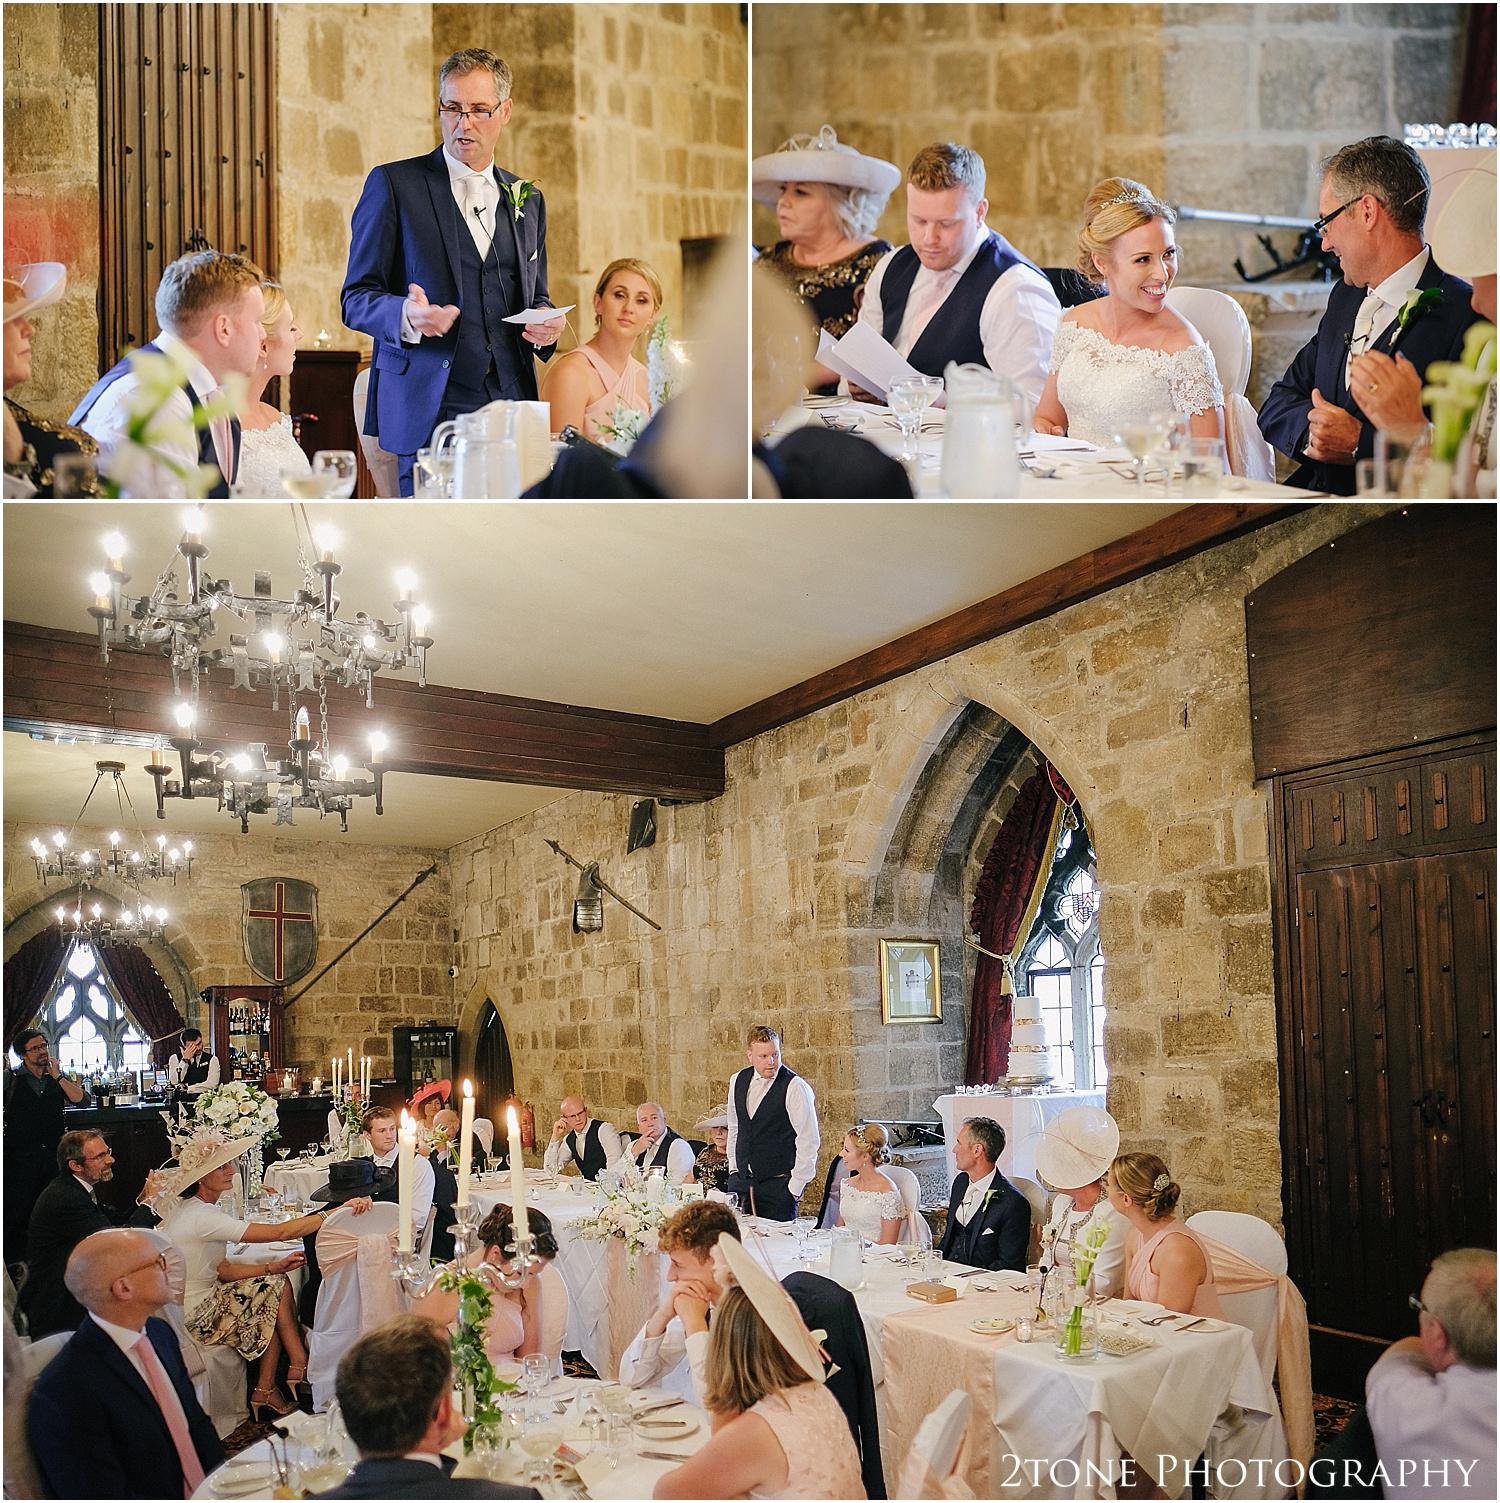 Langley Castle wedding photography 41.jpg